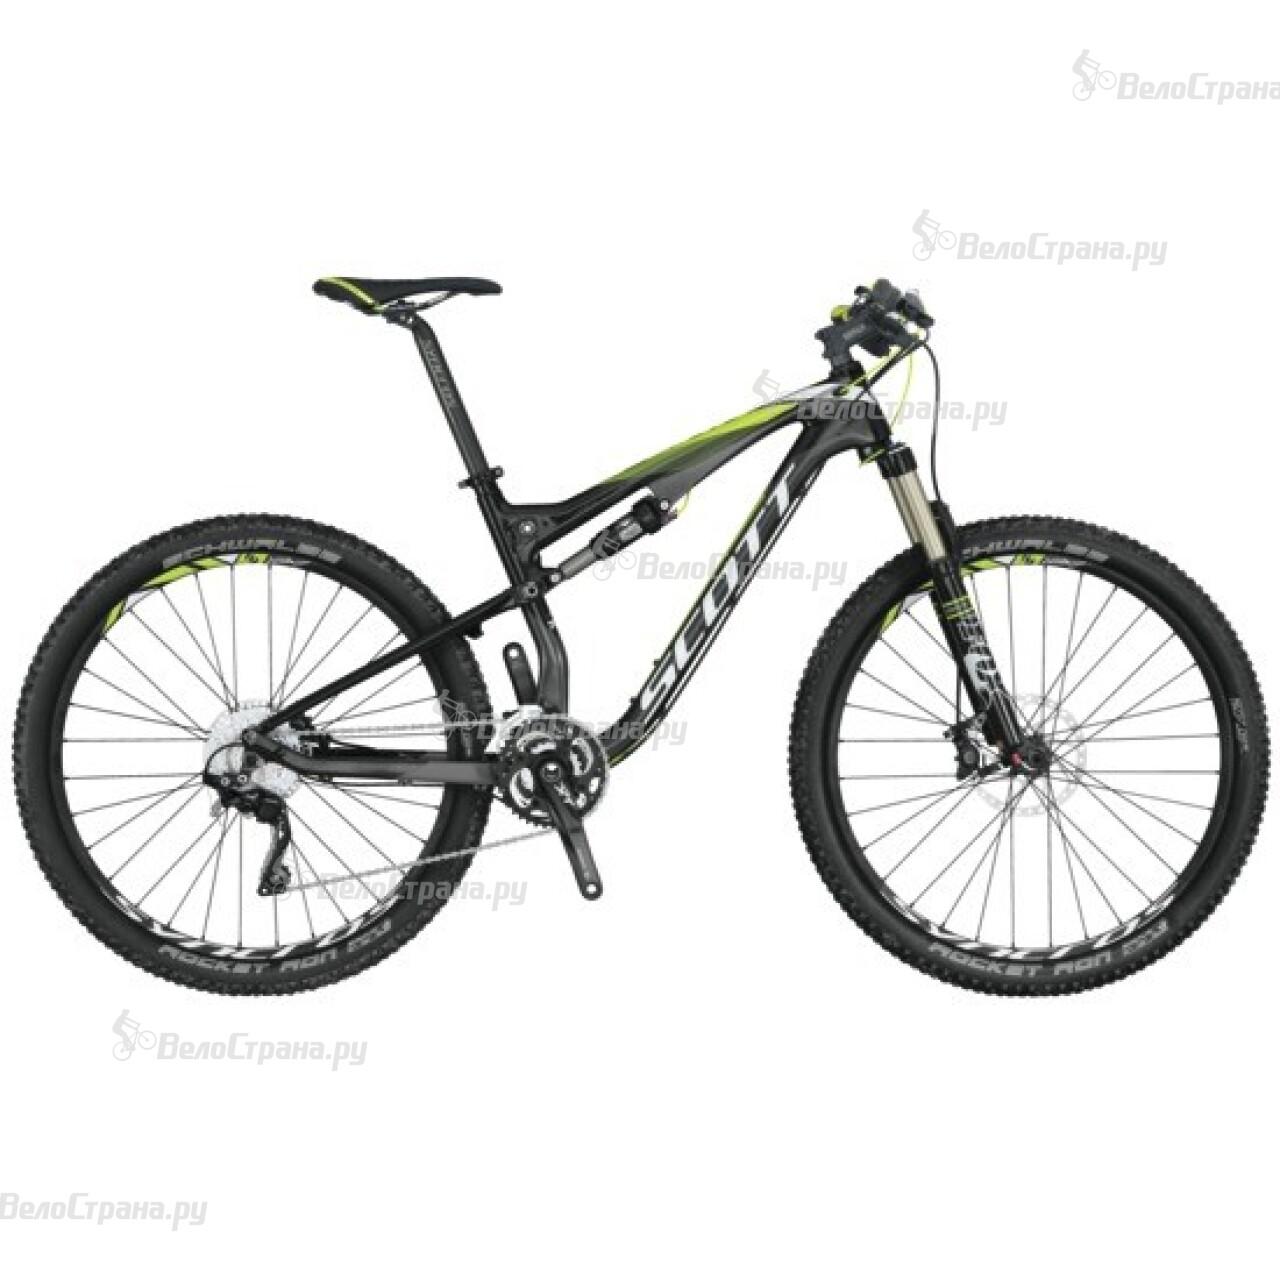 Велосипед Scott Spark 720 (2014)